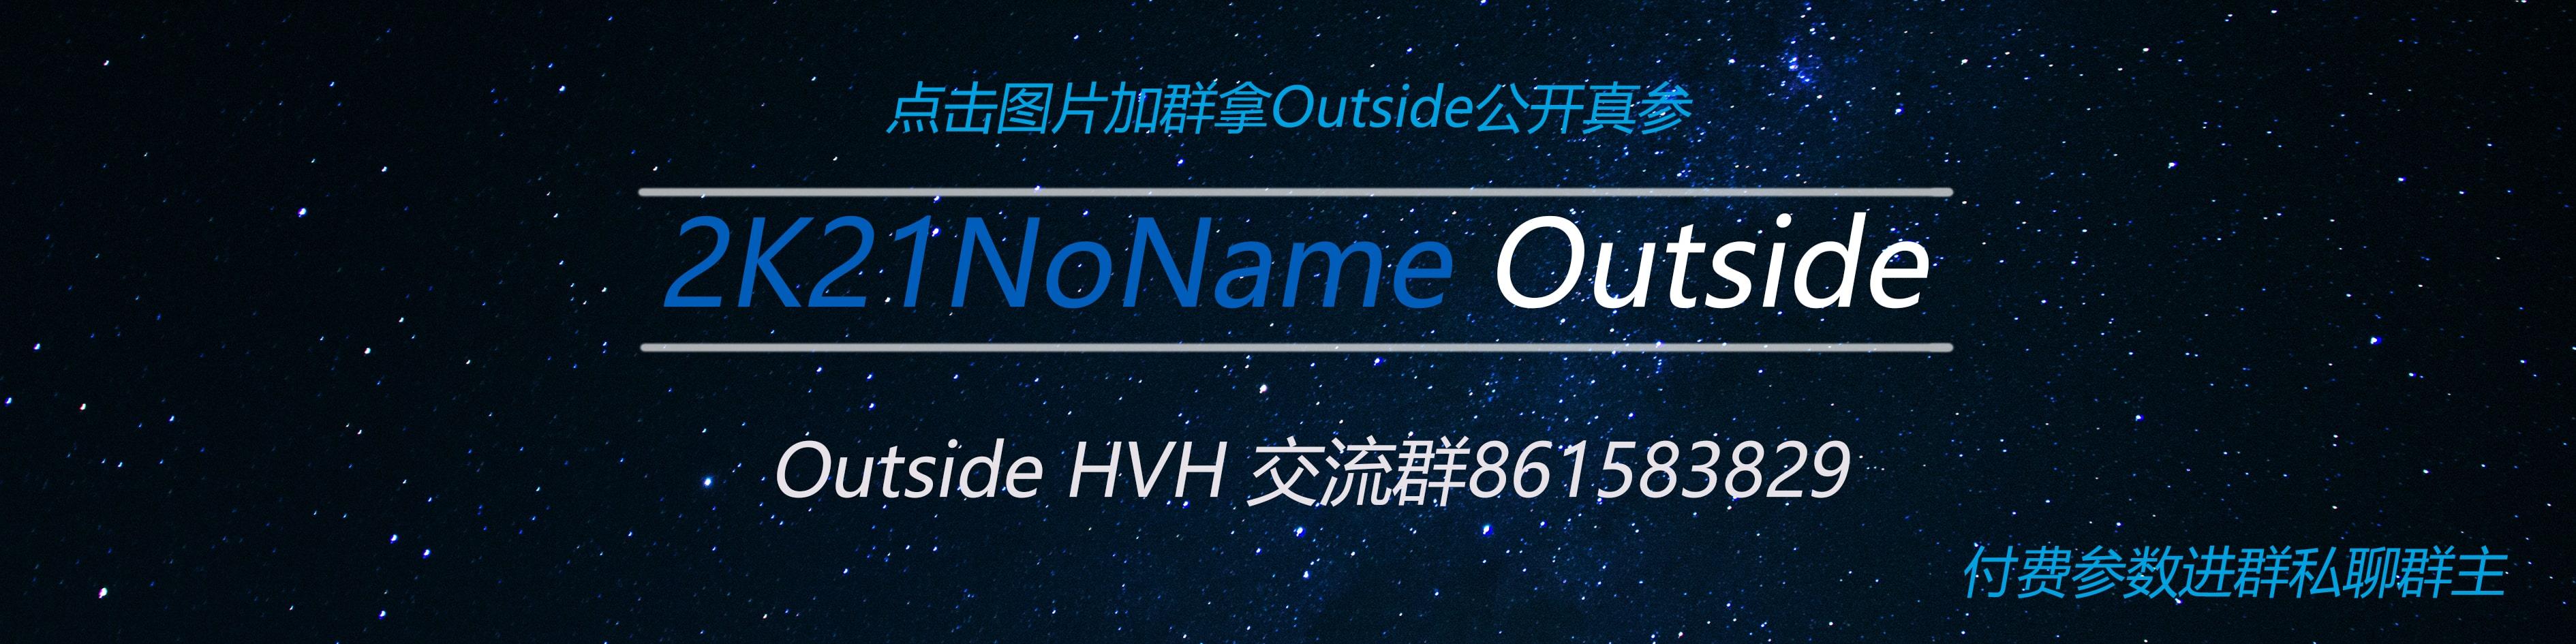 Outside HVH 交流群